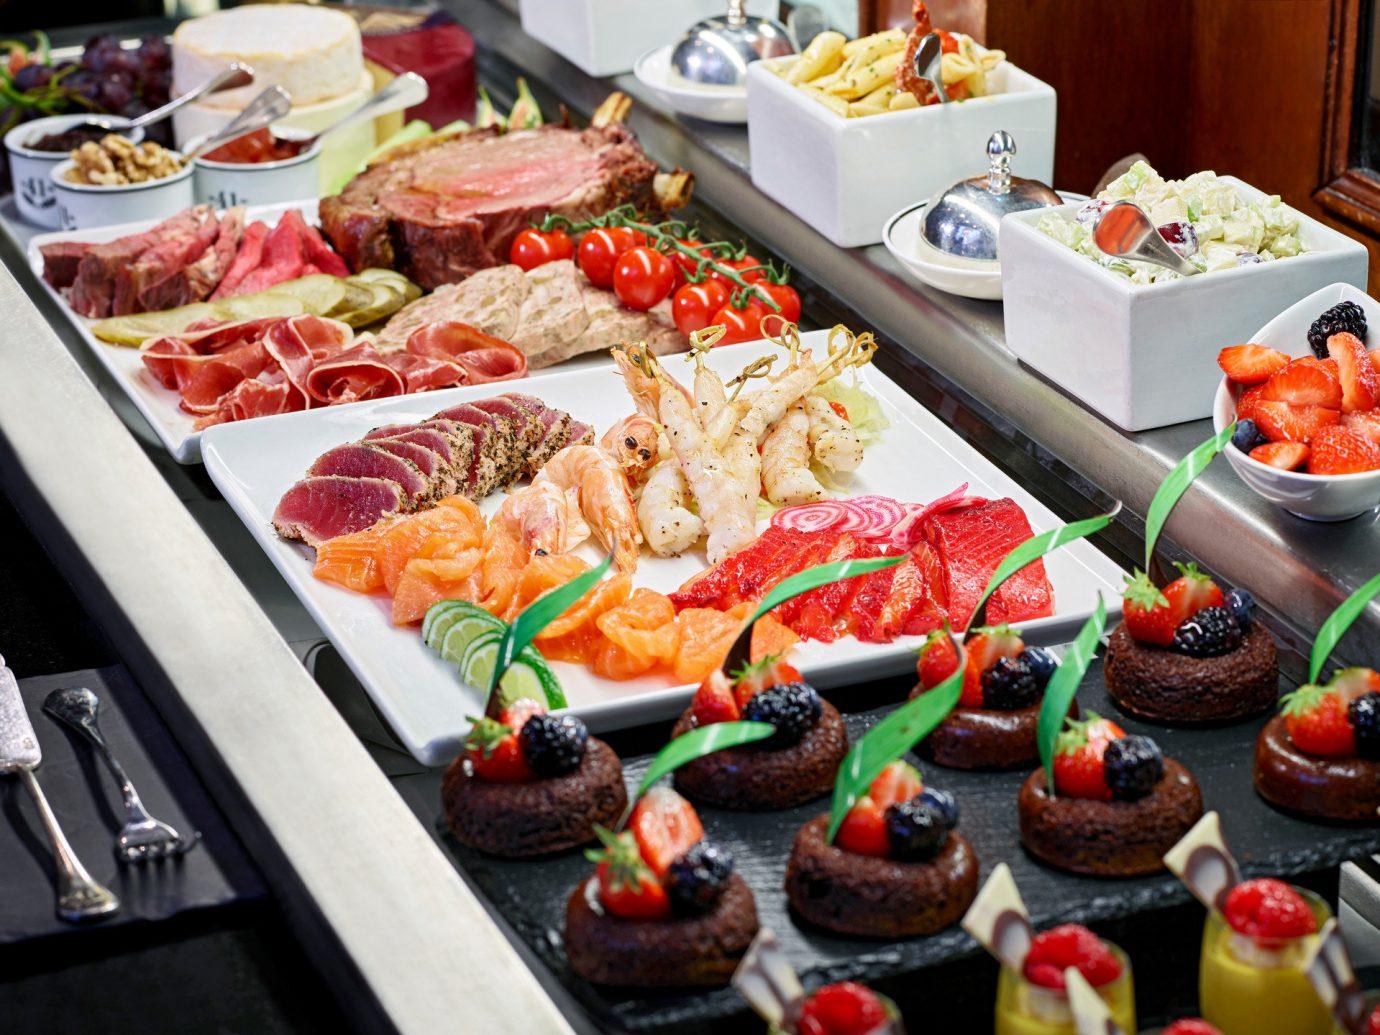 Boutique Hotels Hotels food meal dish buffet cuisine brunch hors d oeuvre sense breakfast several